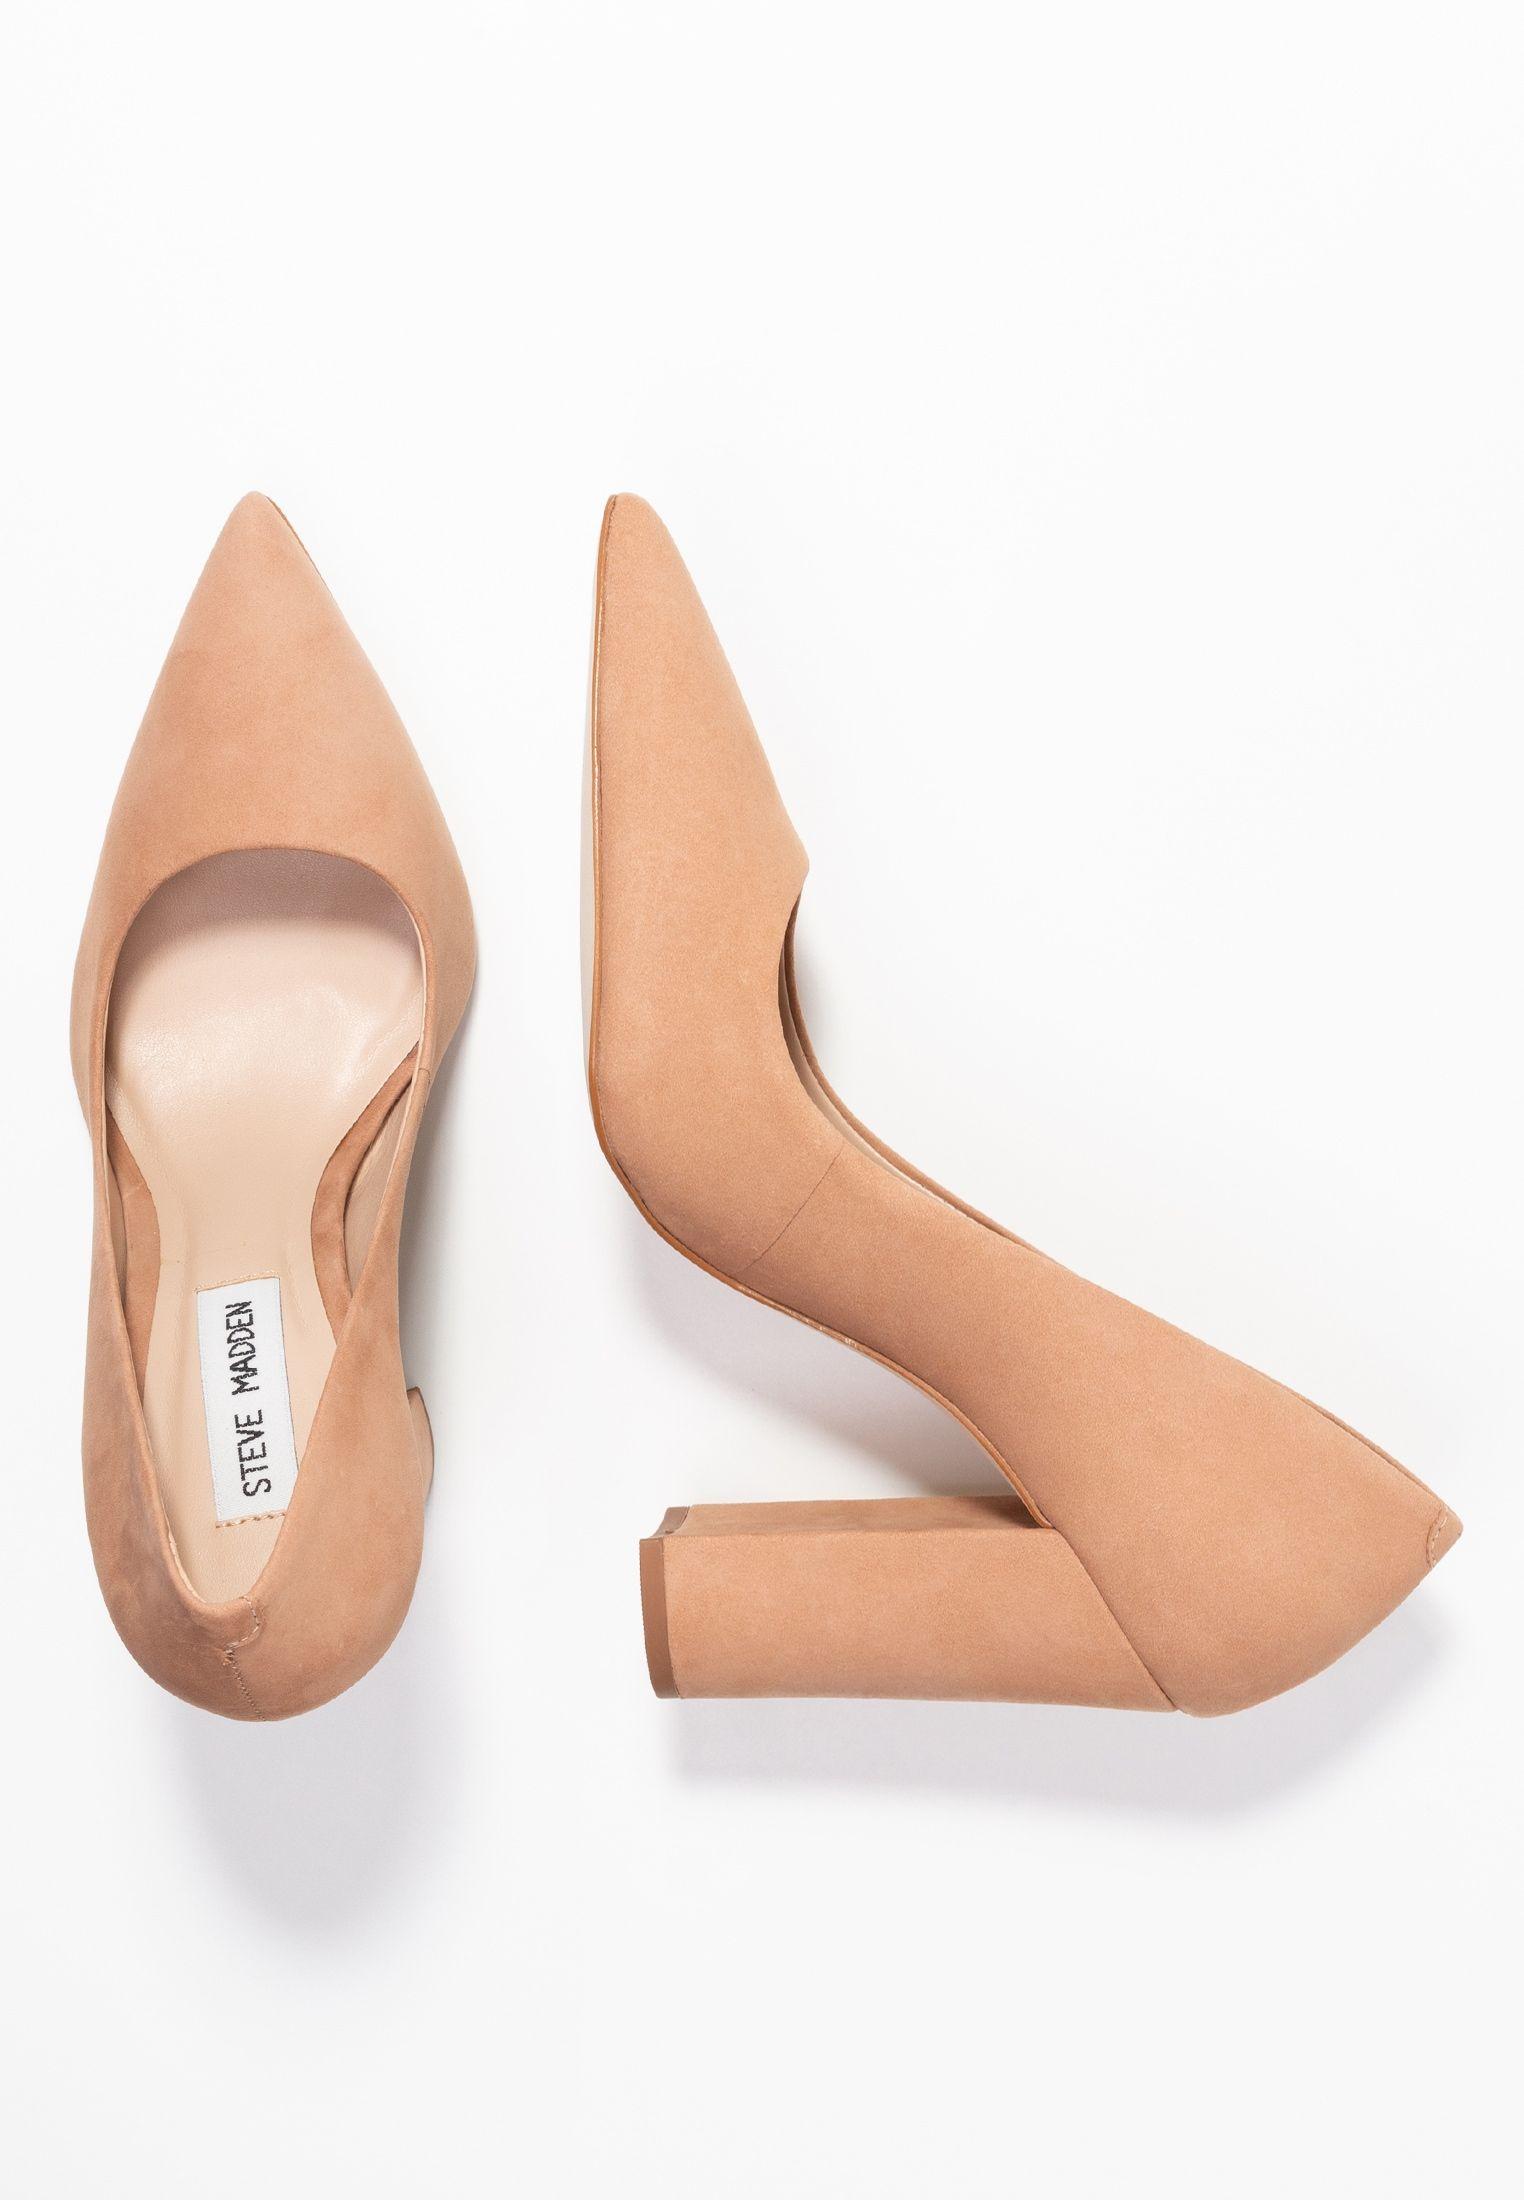 5b23db61f6c PRANCE - High Heel Pumps - camel @ Zalando.de 🛒 in 2019 | Shoes ...